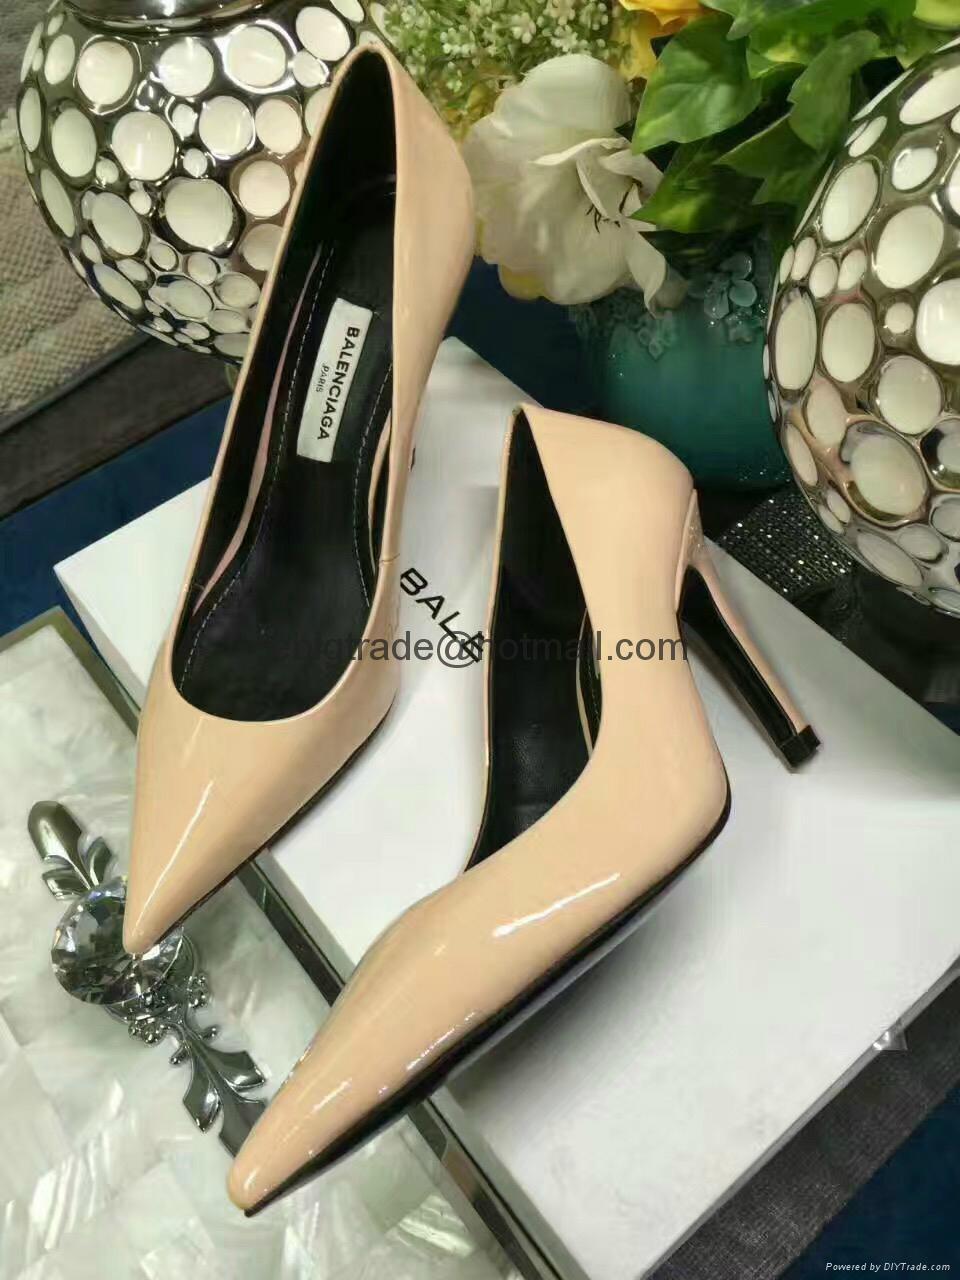 Balenciaga leather shoes